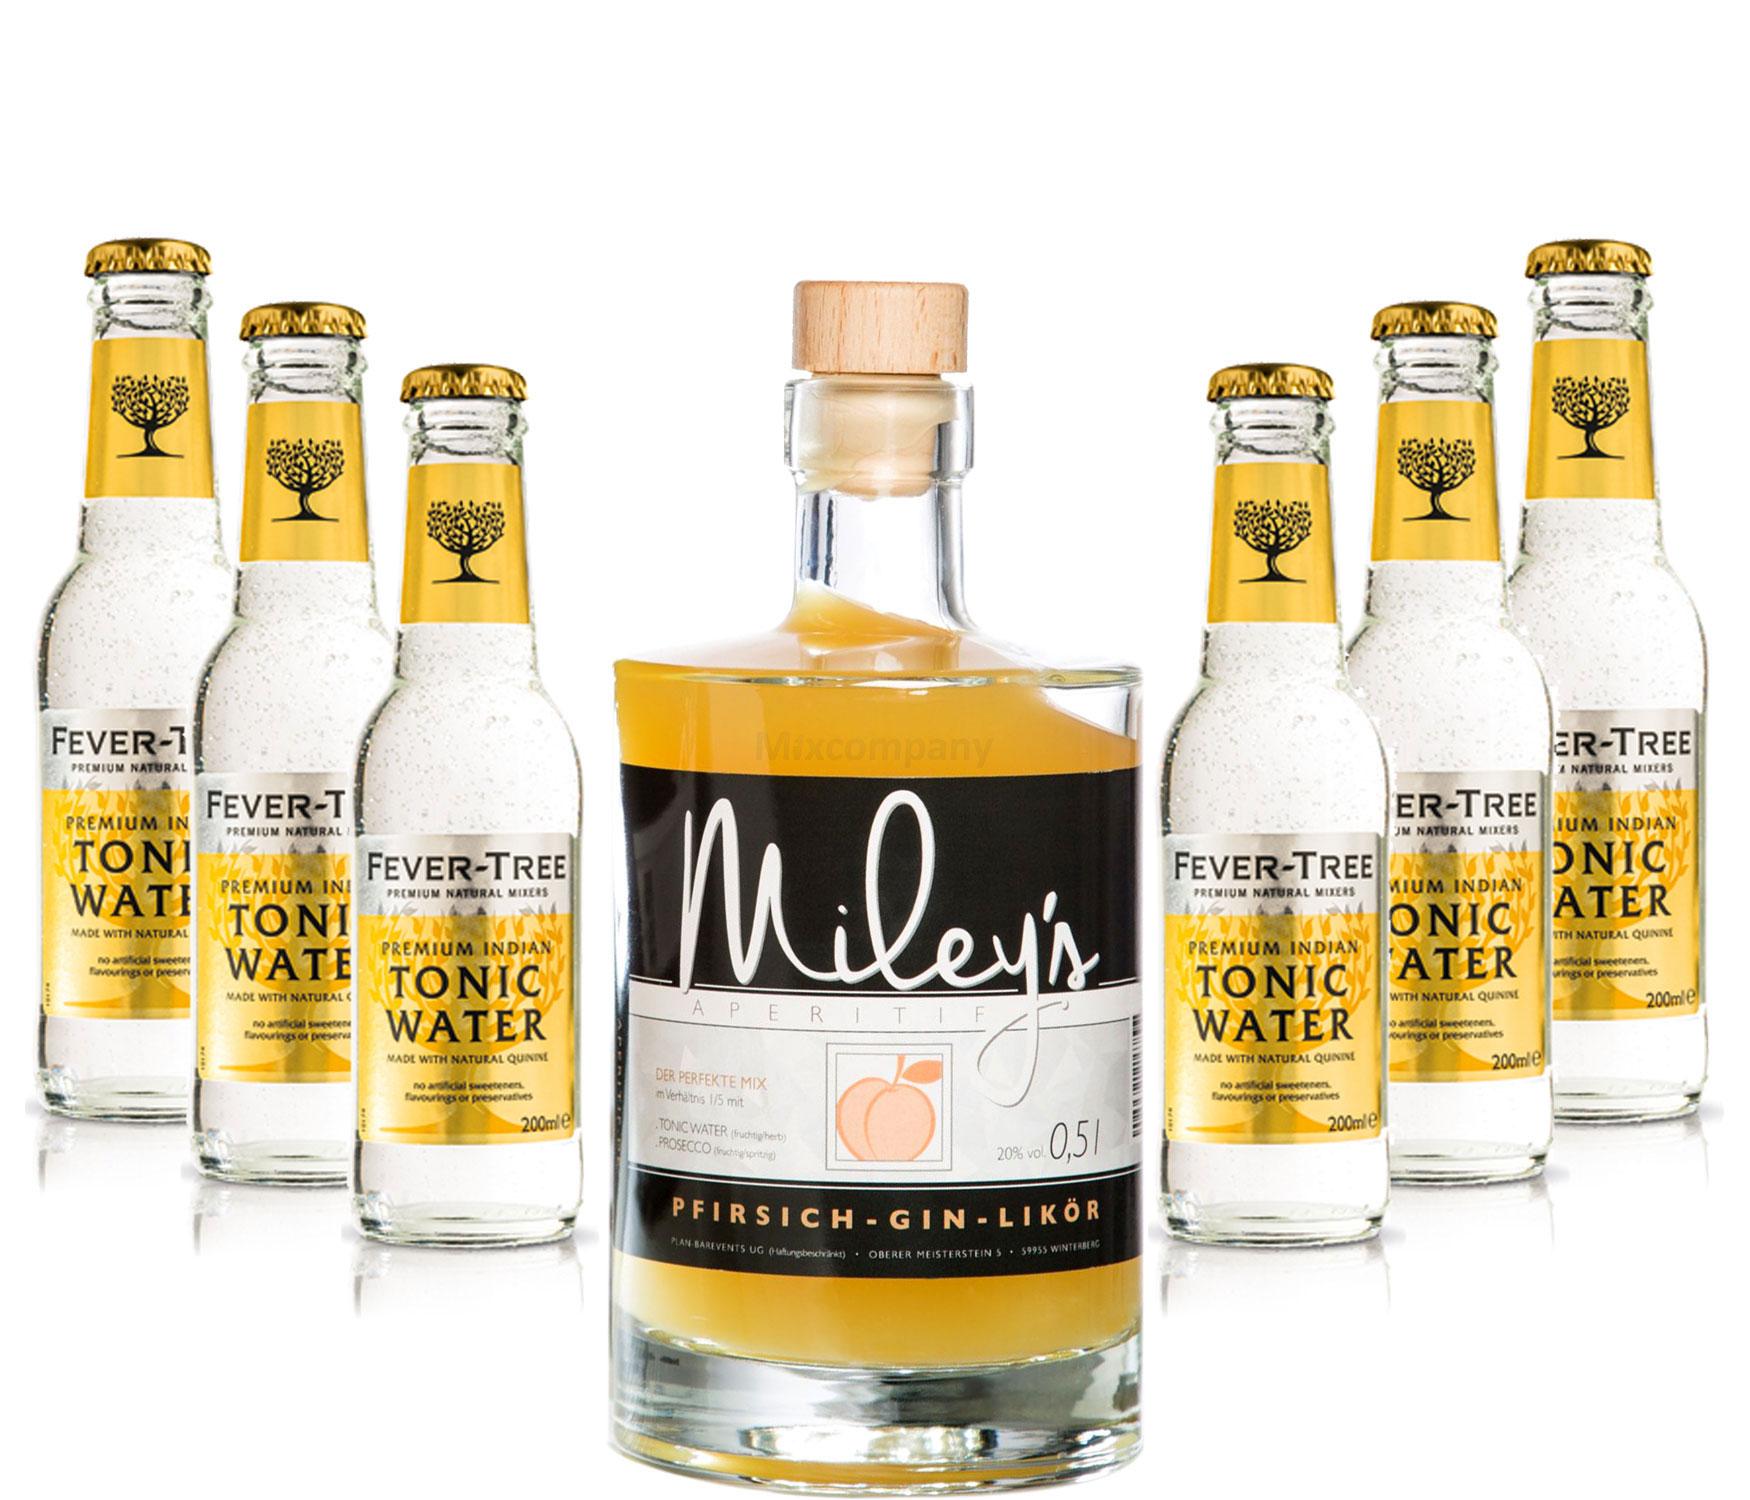 Mileys Pfirsich Gin Likör 0,5l (20% Vol) + 6x Fever Tree Tonic Water 200ml inkl. Pfand MEHRWEG -[Enthält Sulfite]